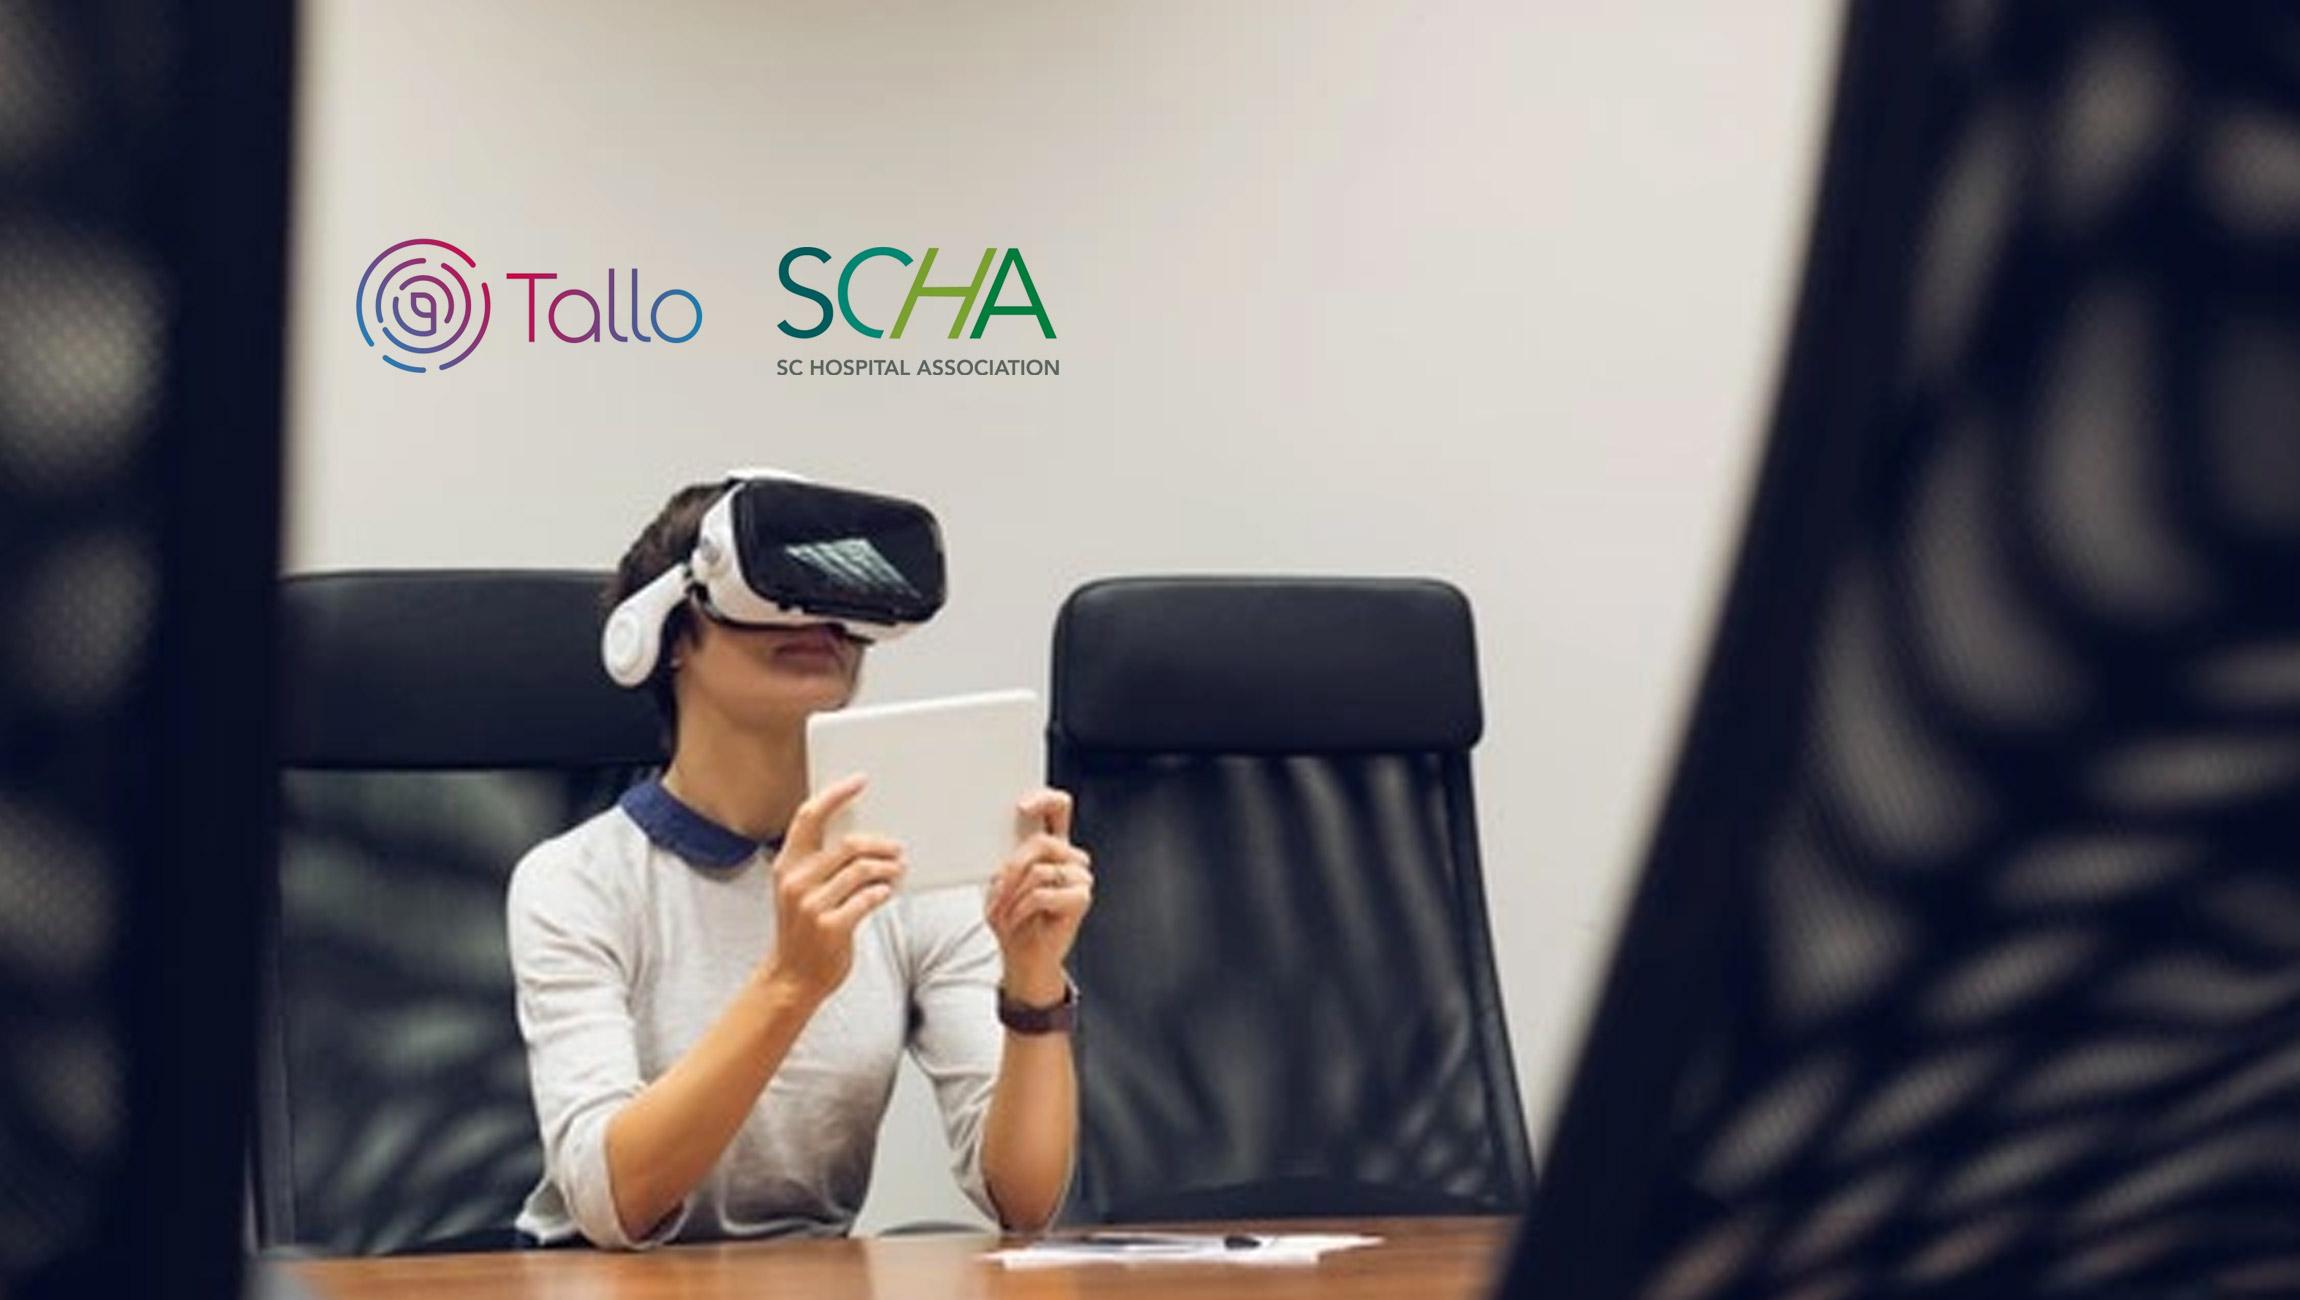 South Carolina Healthcare Employers Hiring For Hundreds Of Jobs During Virtual Career Fair